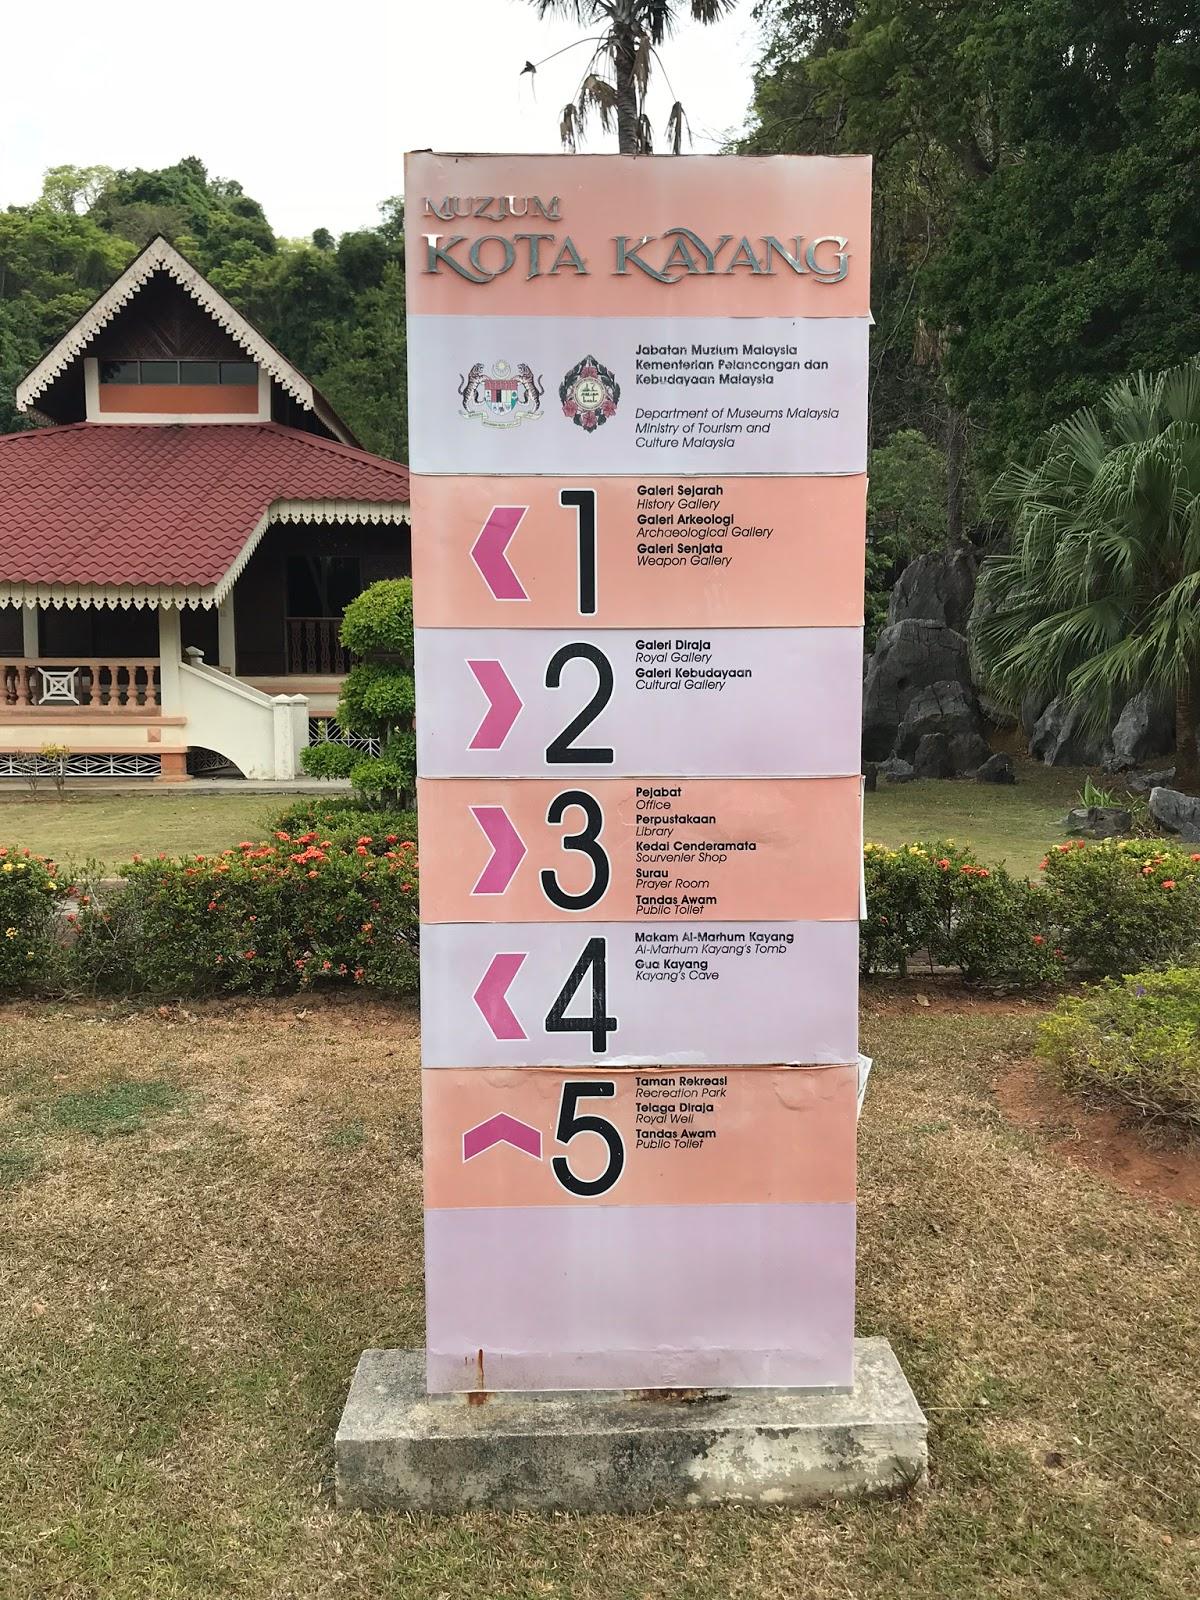 Sejarah Kayang : sejarah, kayang, Kayang, Museum